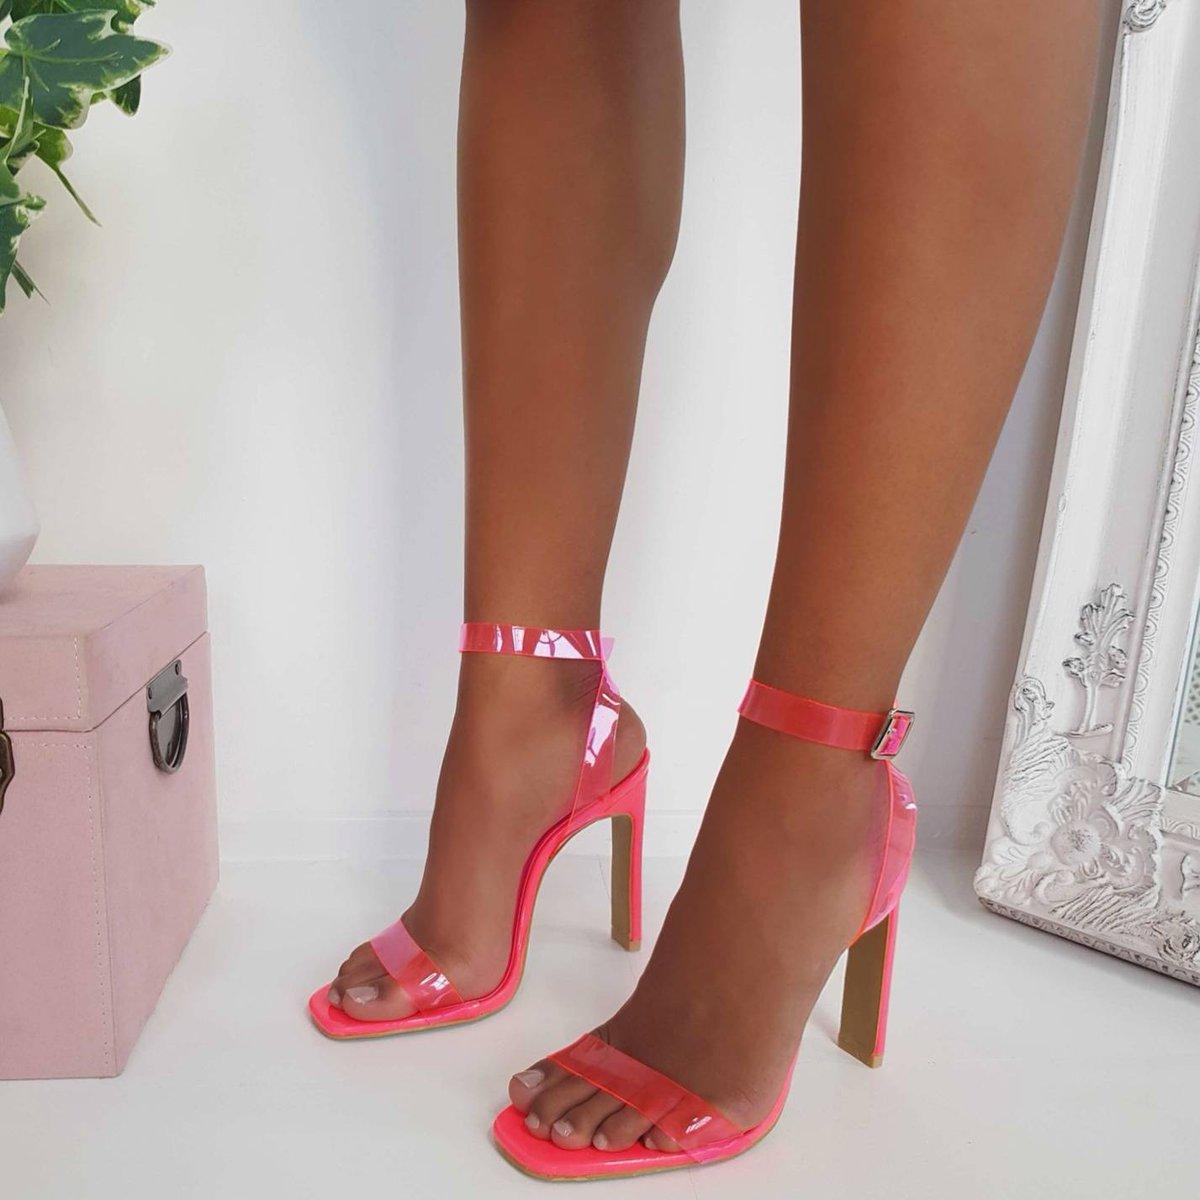 Image for Neon Dreams 💘  The RAZZI Perspex heels got us Krushn rn 😍  Shop ALL New Drops 👉🏽 https://t.co/5y08kiUfWH #ikrushbabe https://t.co/vjxpXqW9b1